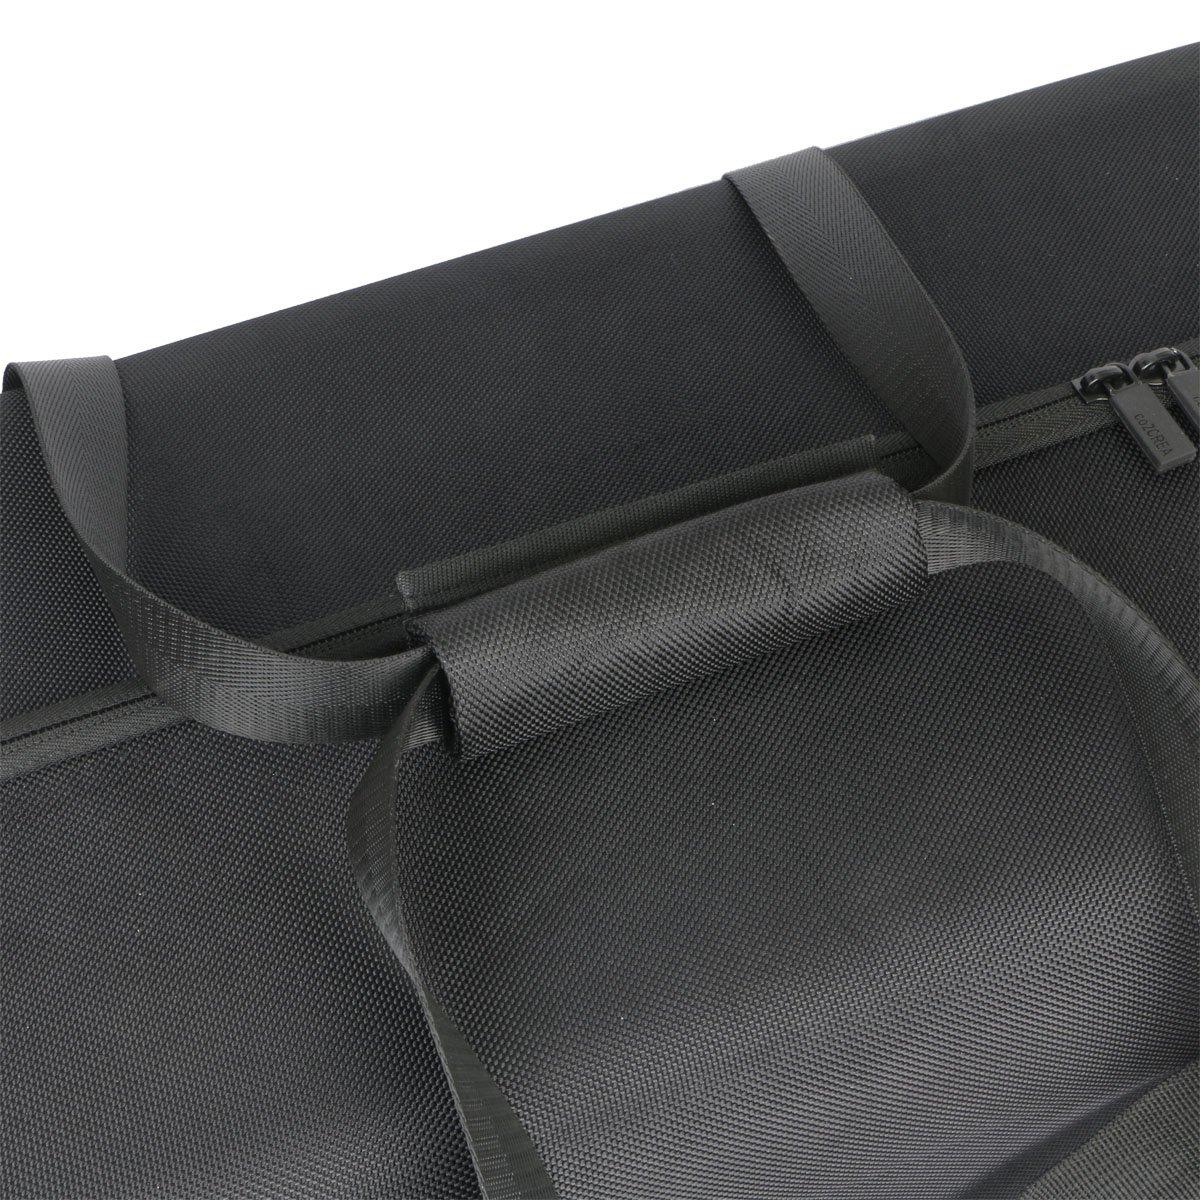 Hard Travel Case for Sony GTKXB60/B GTKXB60/L High Power Portable Bluetooth Speaker by co2CREA by Co2Crea (Image #5)